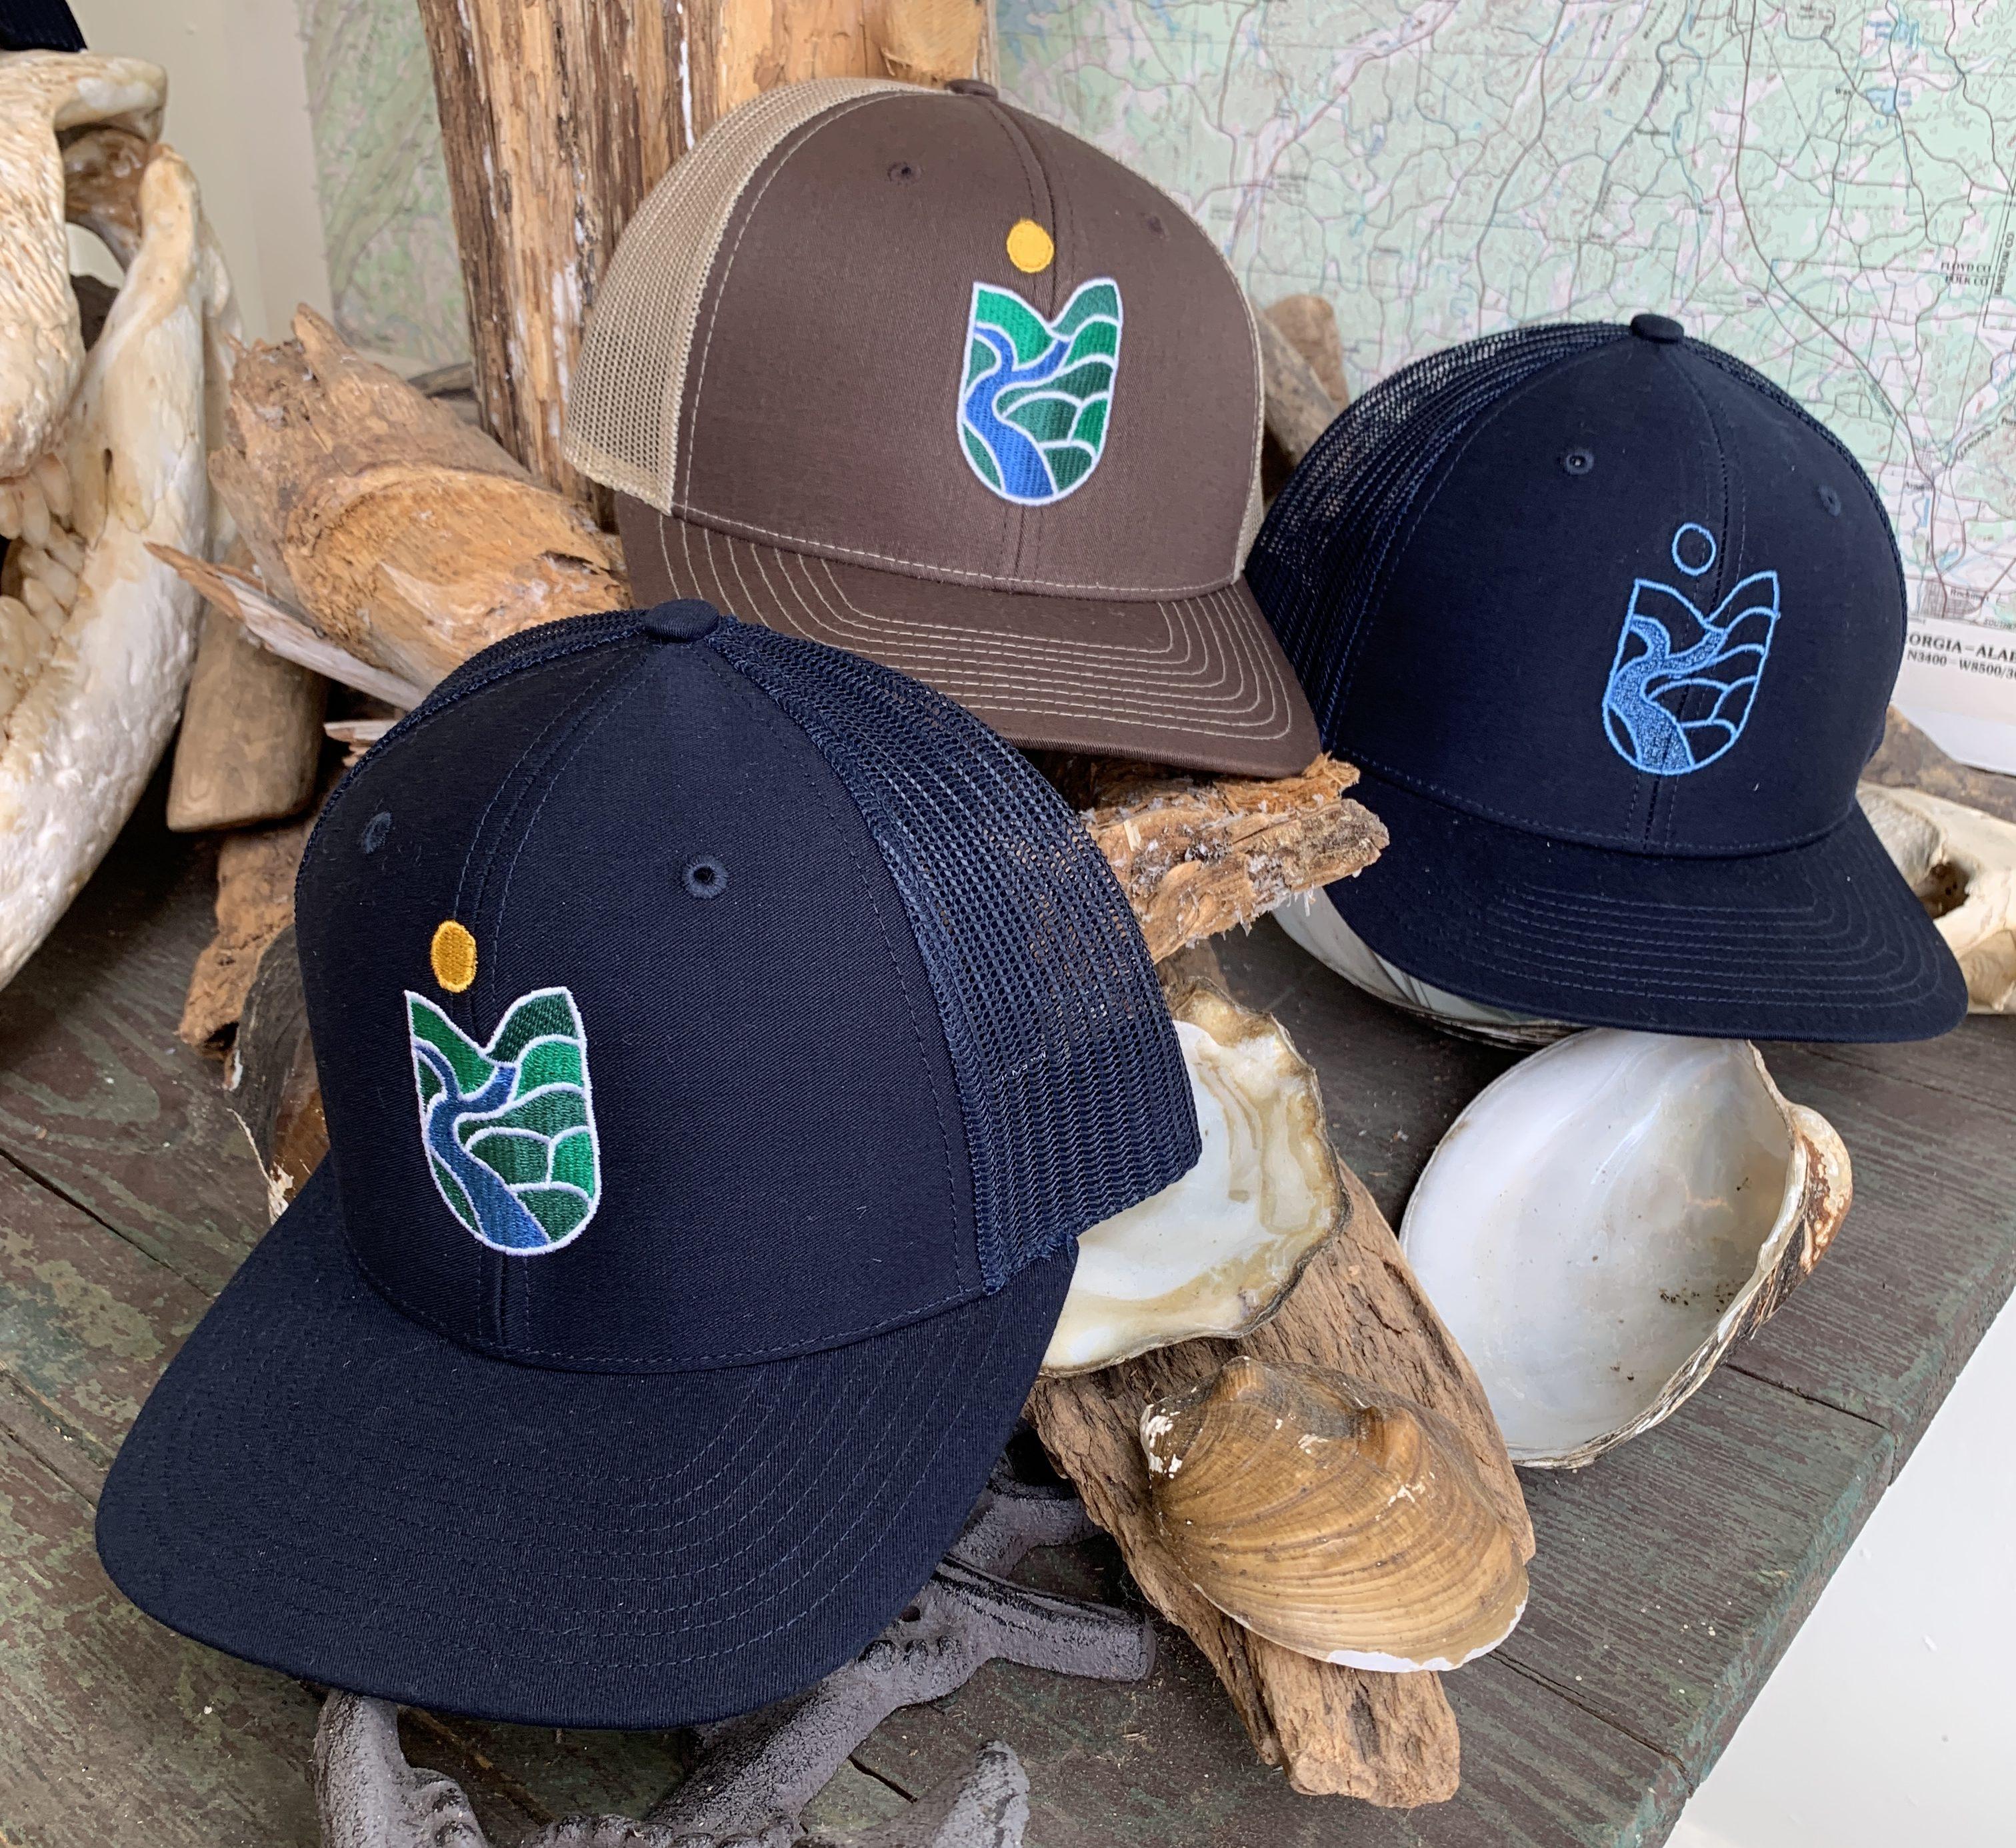 0a30b2ce4 CRBI Graphic Trucker Hat